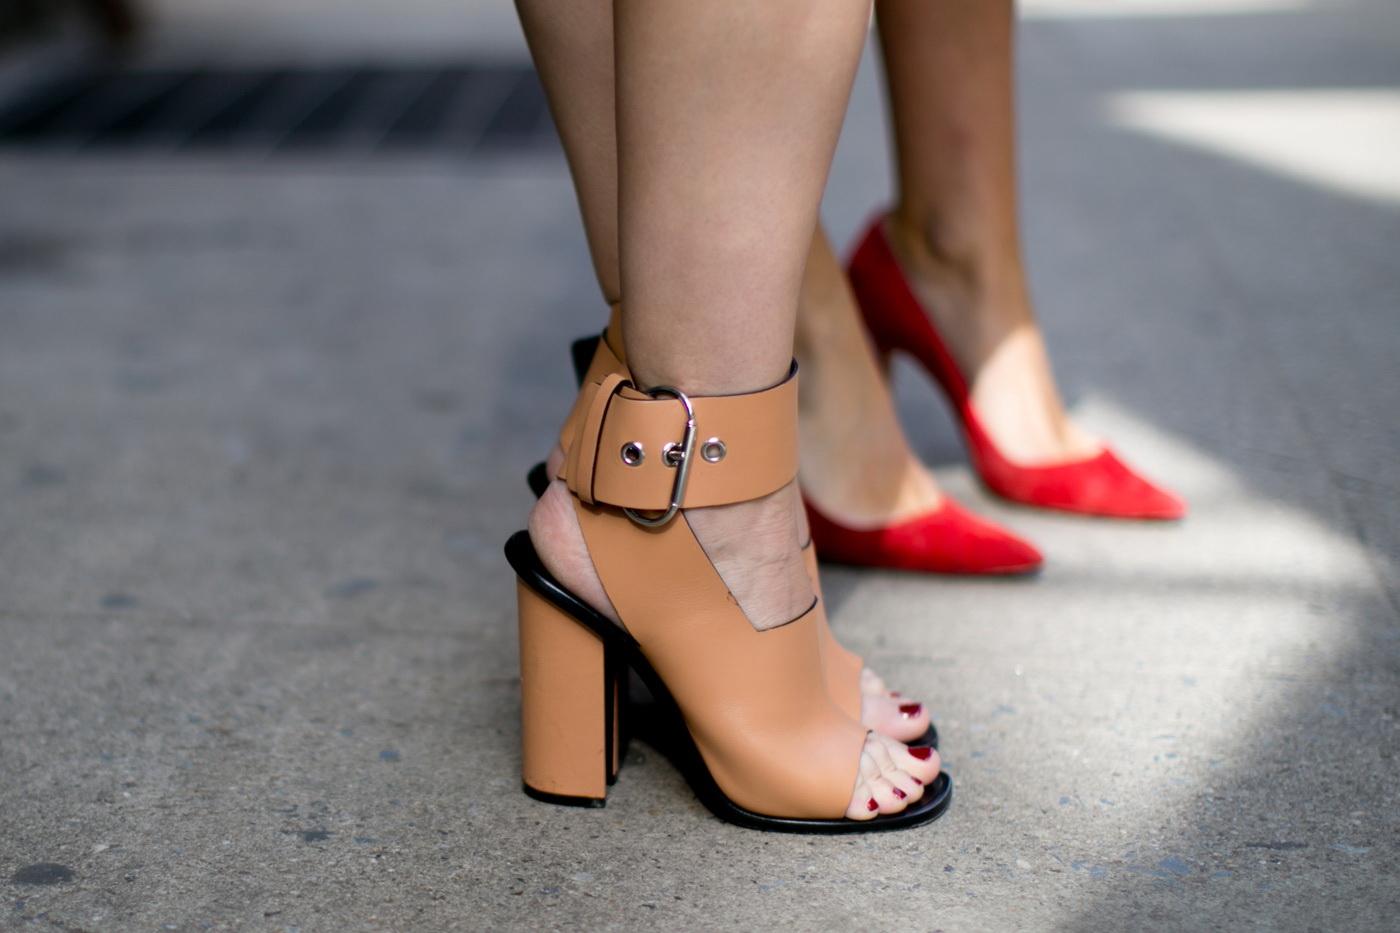 کفش پاشنه پهن کرم